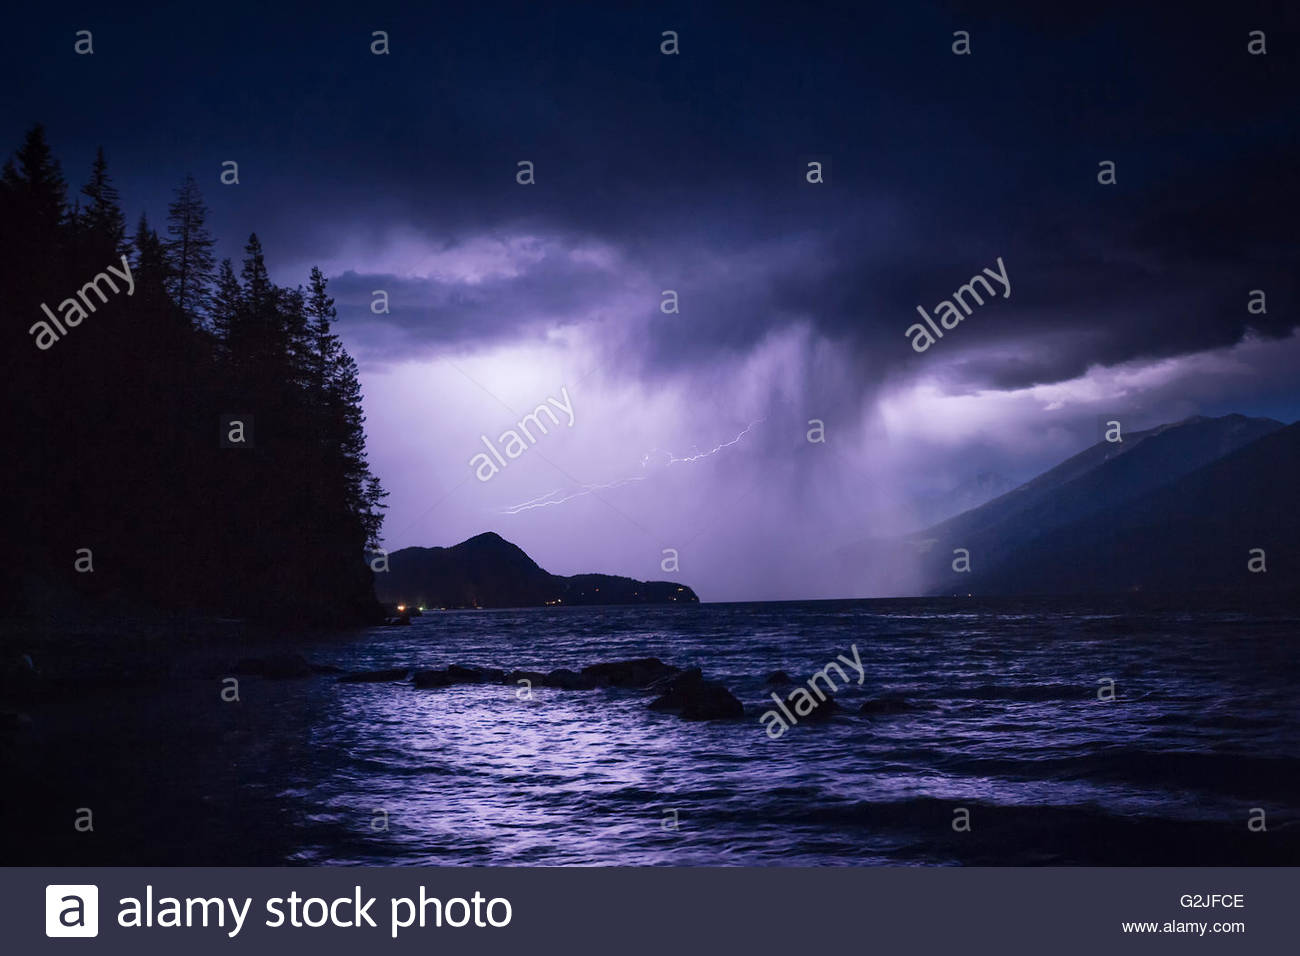 Lightning and a passing rainstorm over Kootenay Lake, Ainsworth Hot Springs, British Columbia, Canada - Stock Image